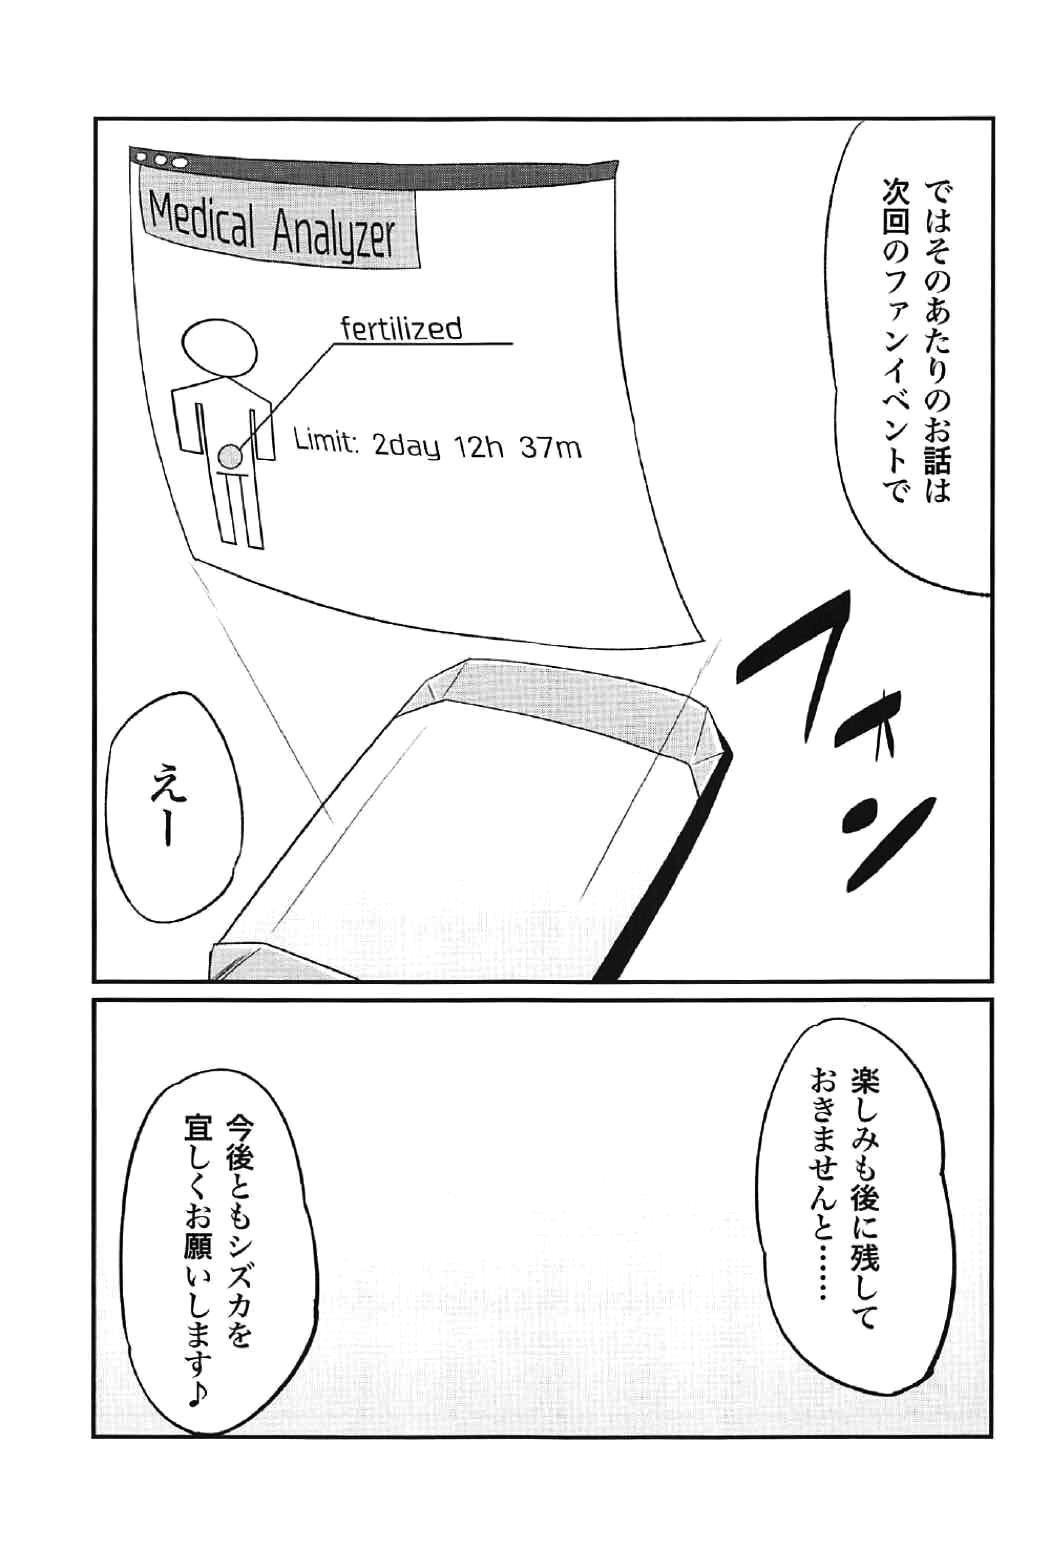 DC Ban Kuonji Shizuka to Iku Dokidoki Fan Bus Tour 43